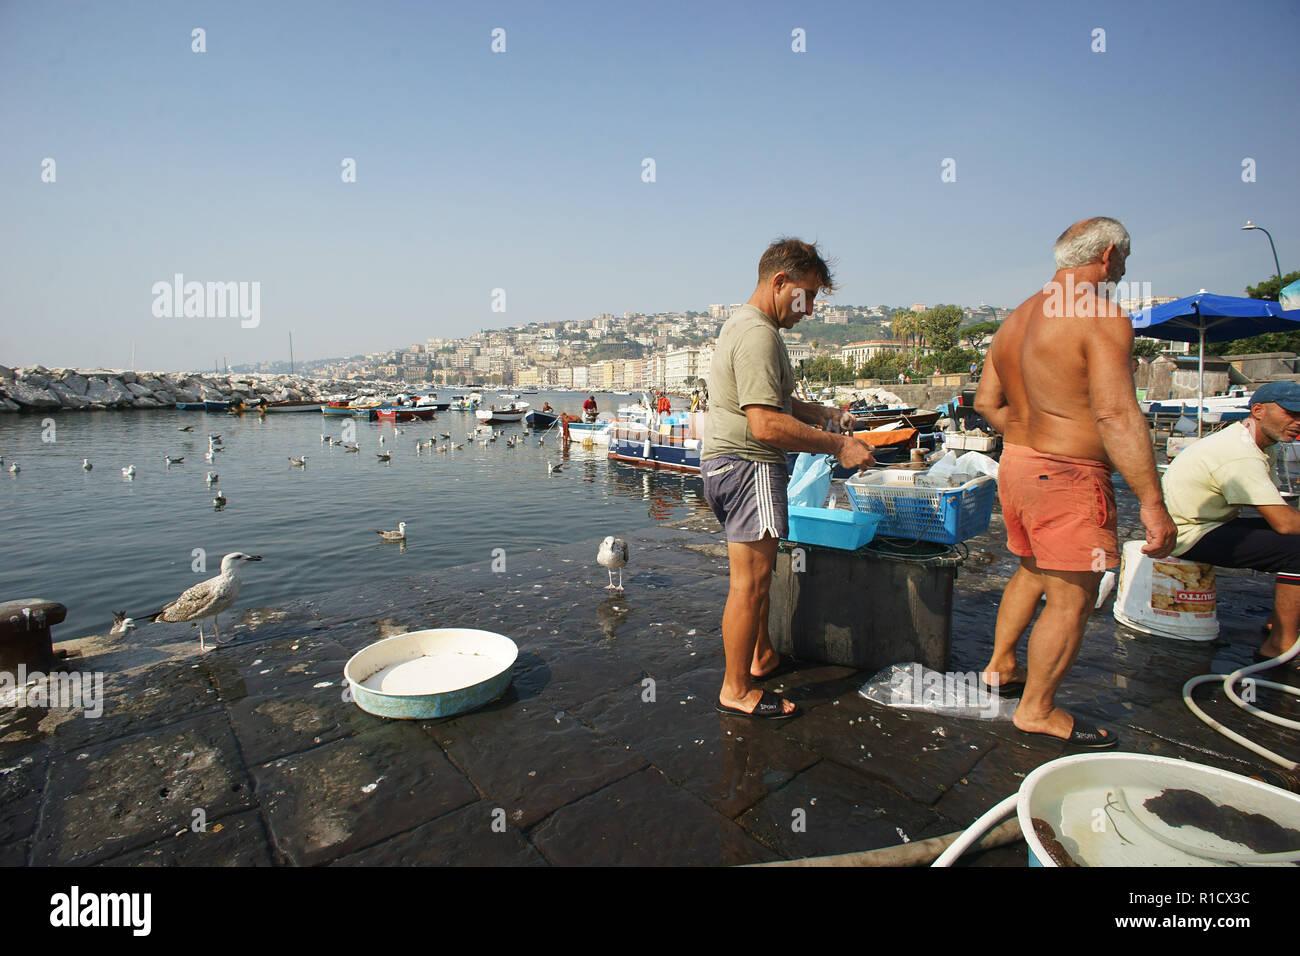 Fisherman selling fish, rotonda Diaz, City of Naples, Gulf of Naples, Italy - Stock Image